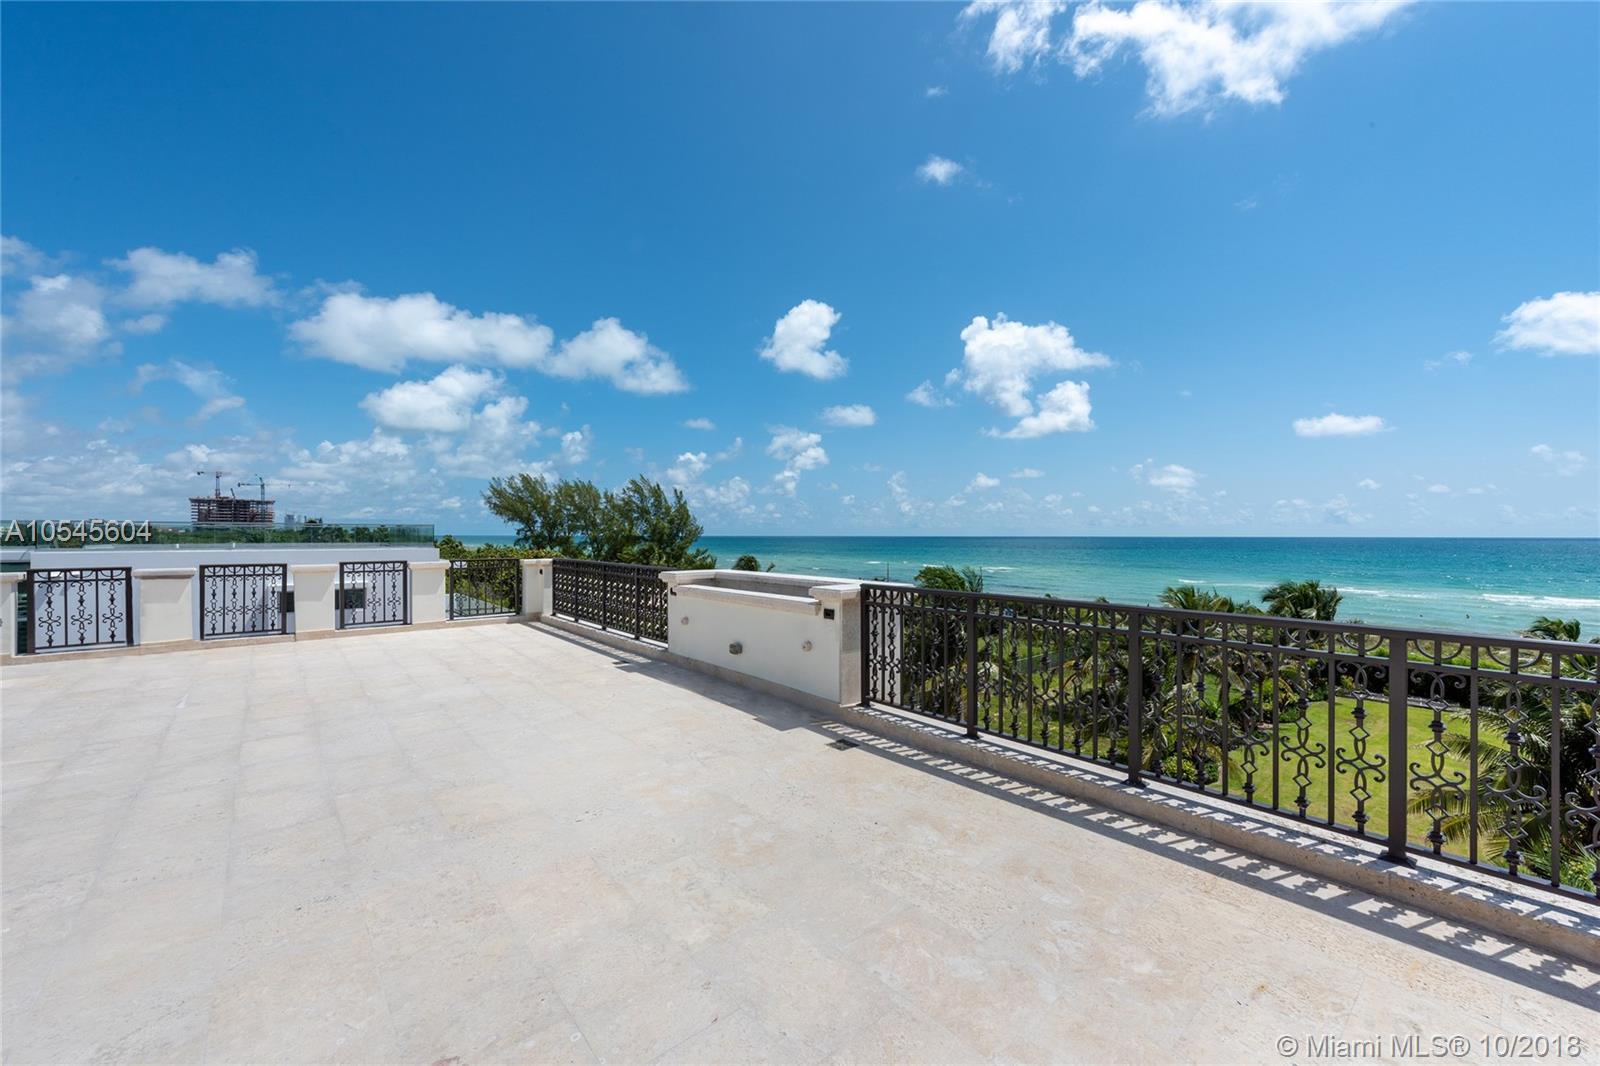 7825 Atlantic way- miami-beach-fl-33141-a10545604-Pic17